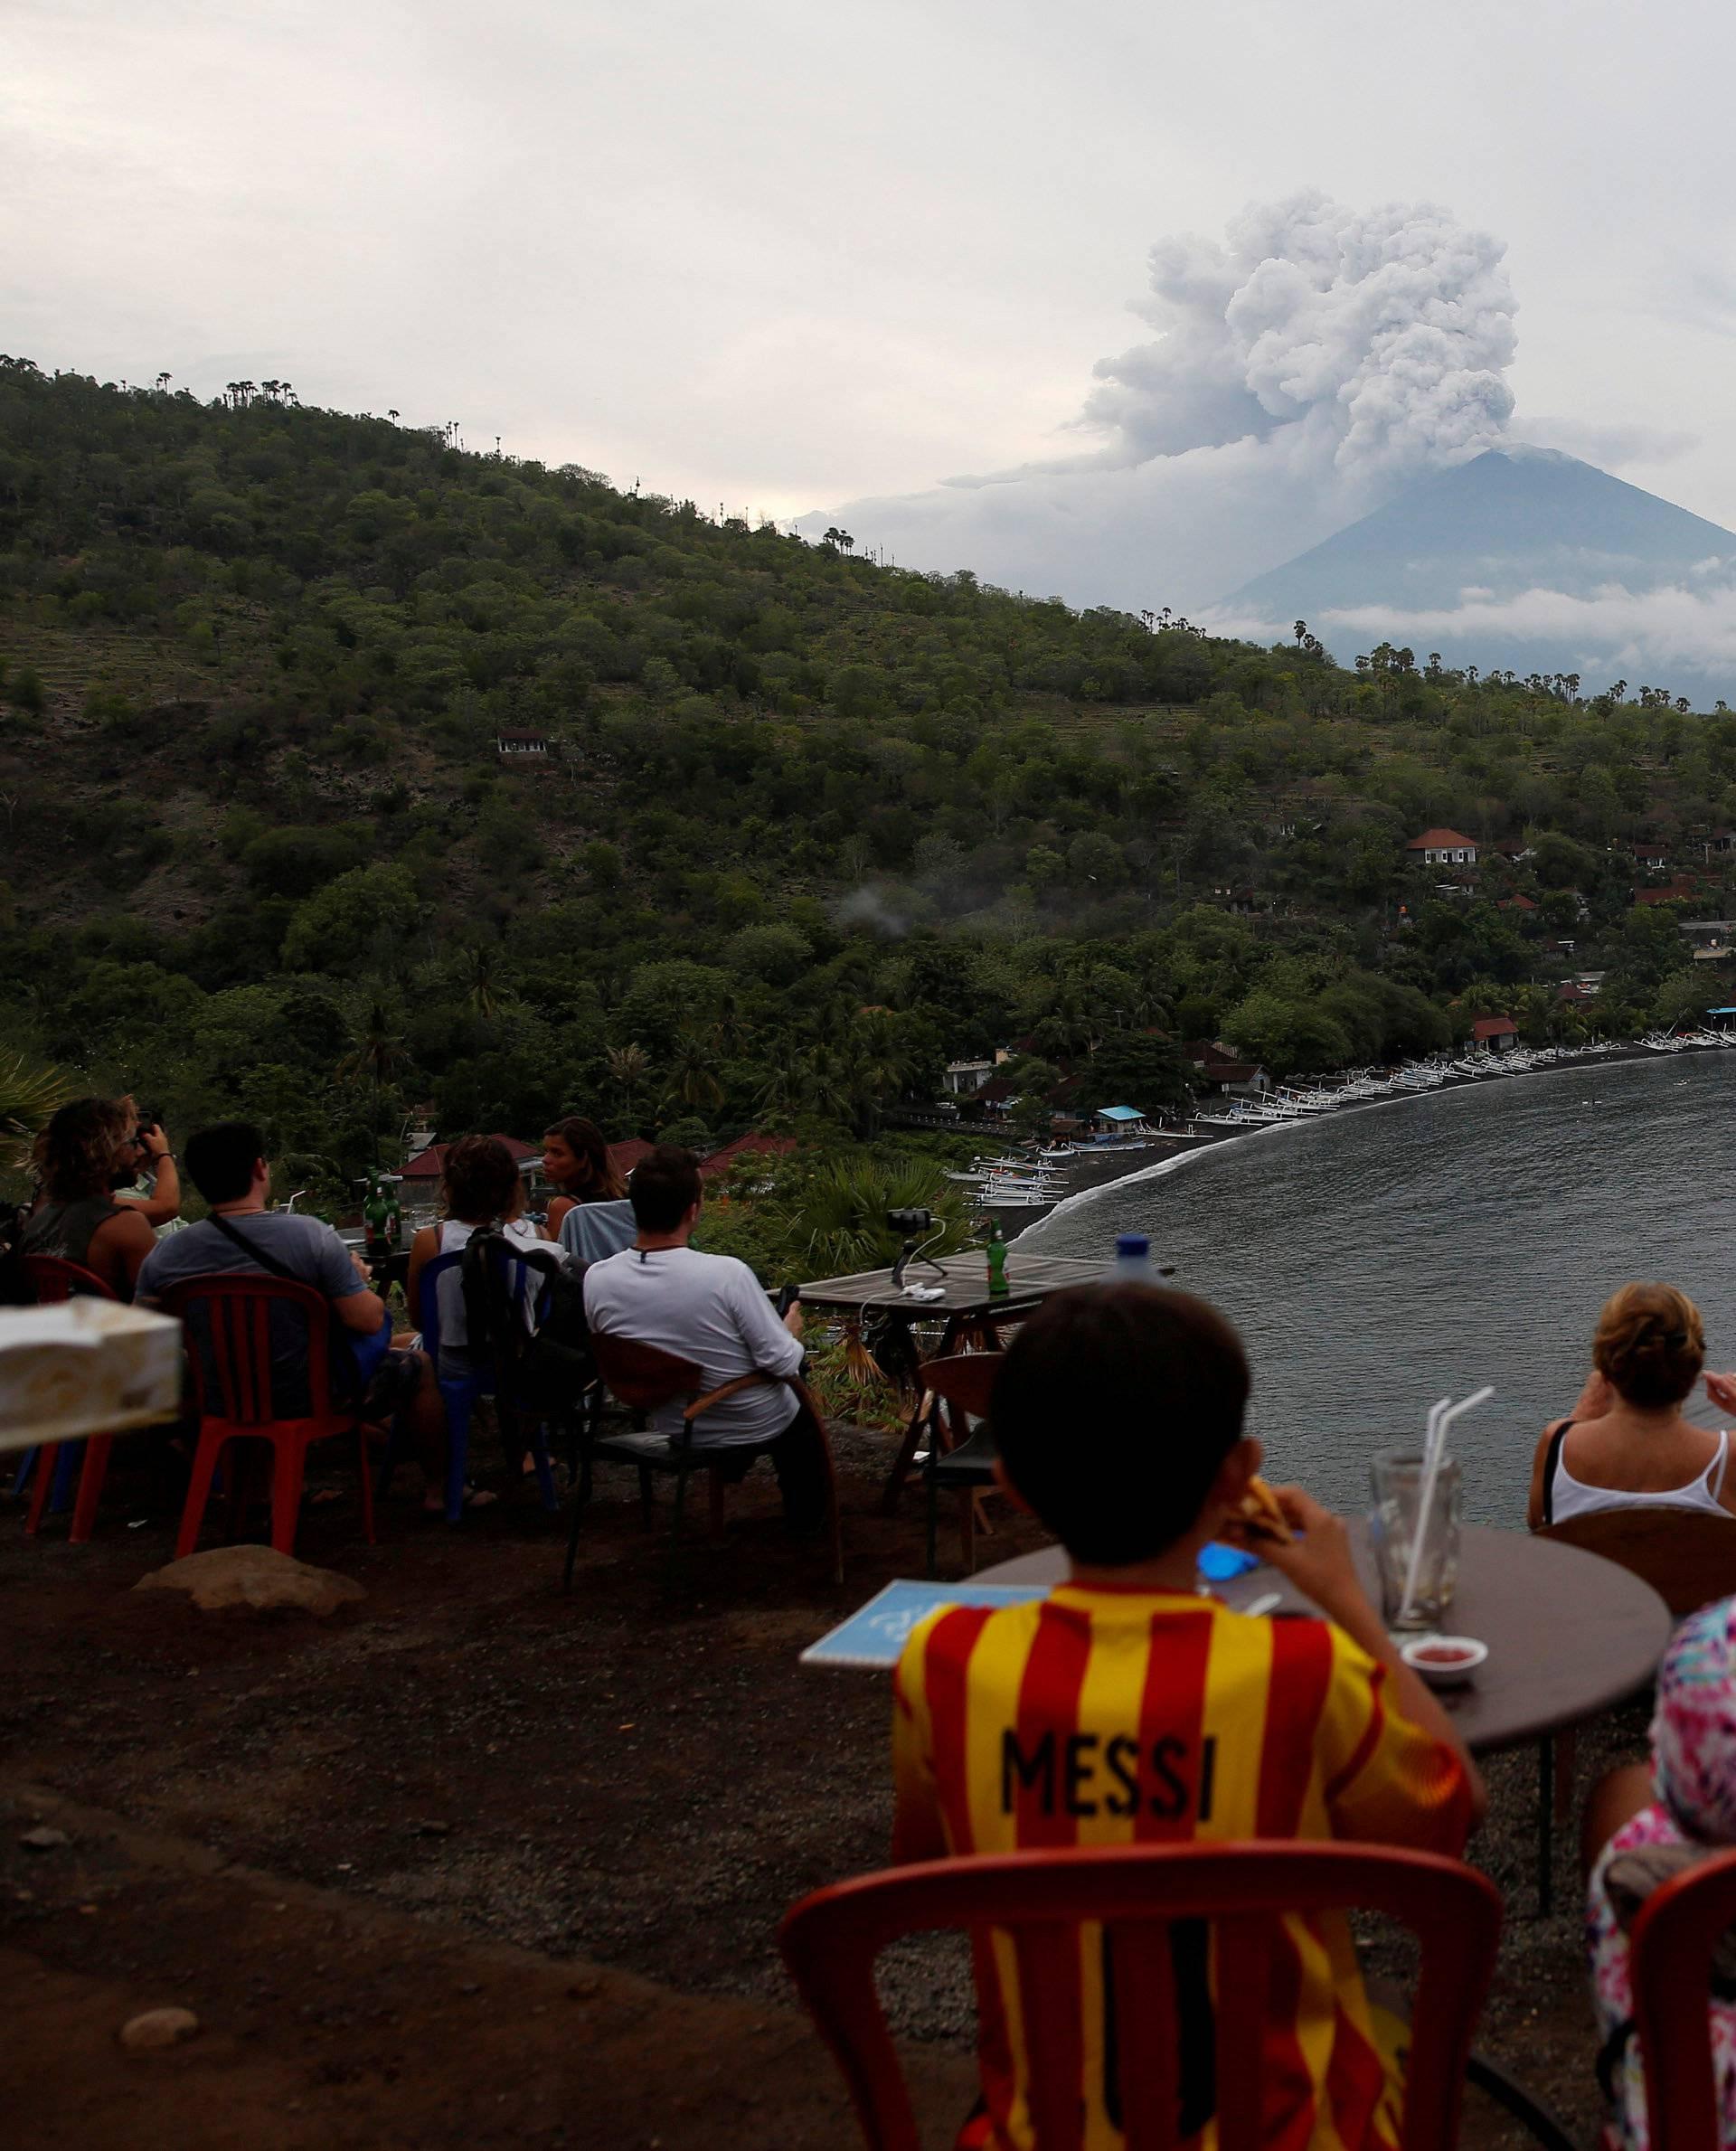 People watch Mount Agung volcano erupt from a cafe near Amed, Karangasem Regency, Bali